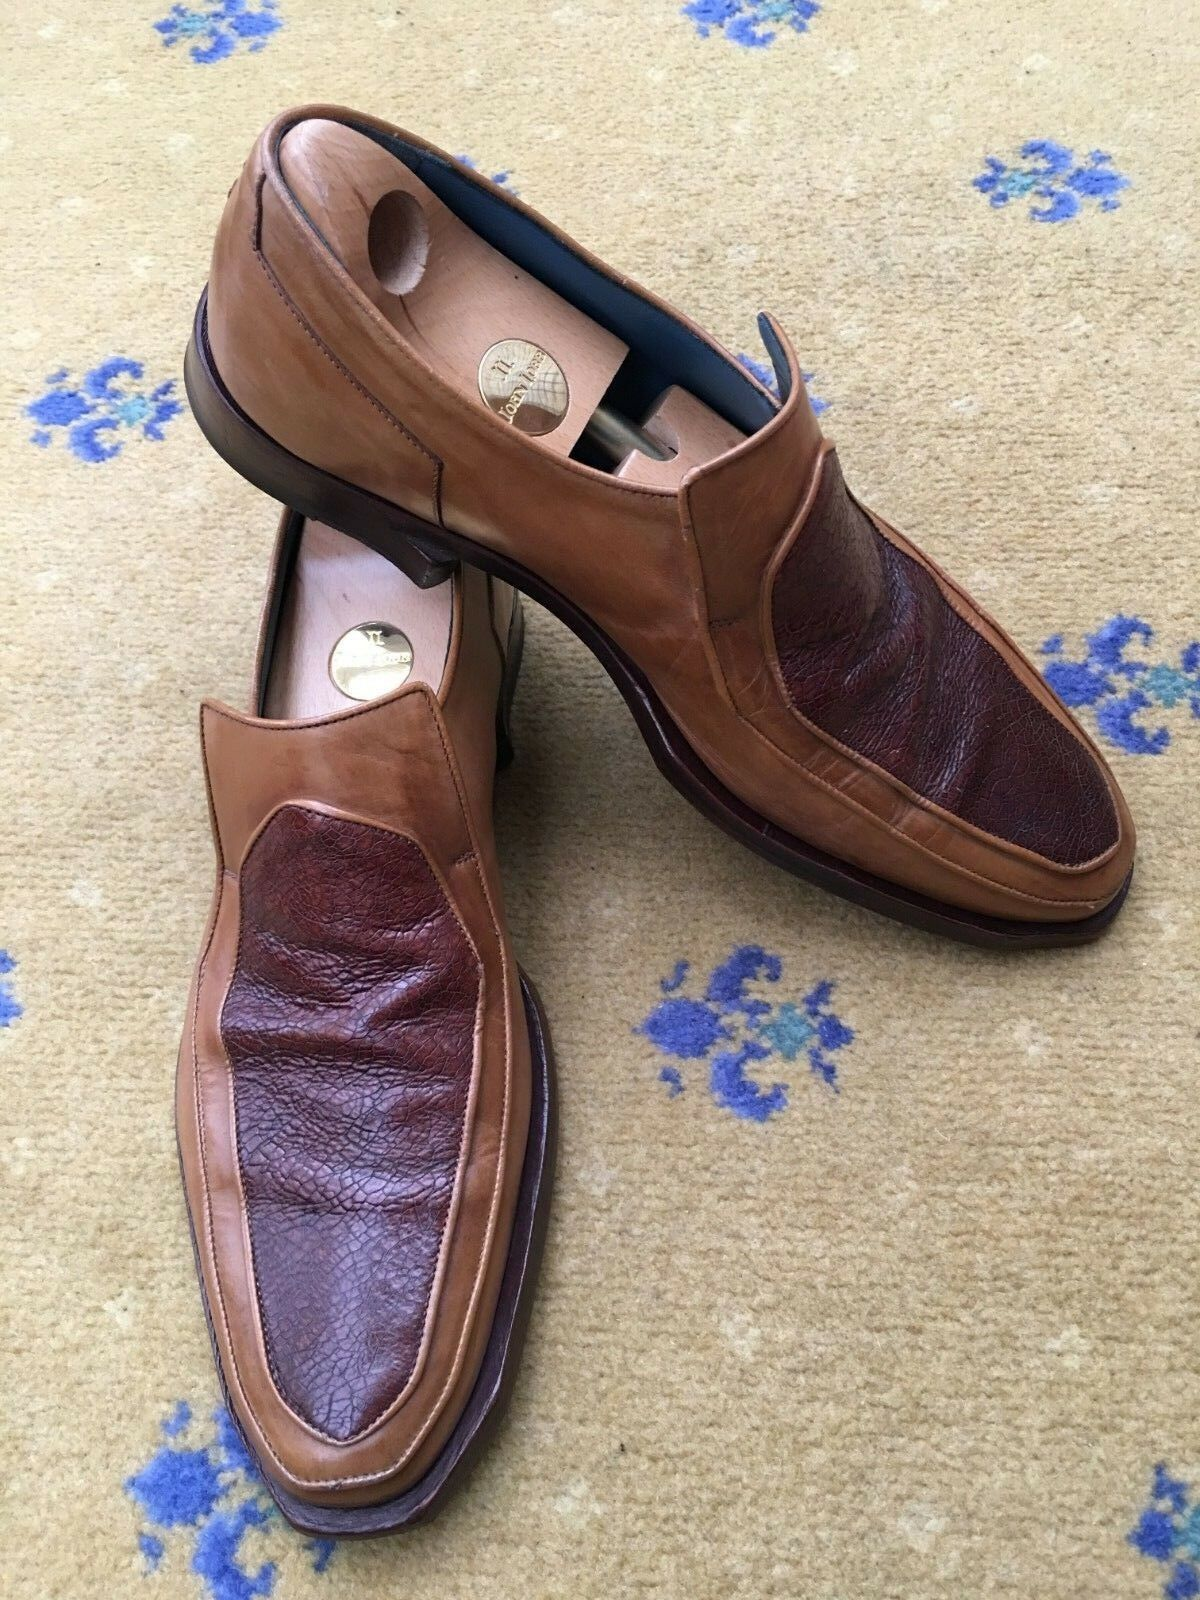 Oliver Schuhes Sweeney   Herren Schuhes Oliver Tan Braun Leder Loafers UK 9 US 10 EU 43 3c40f6